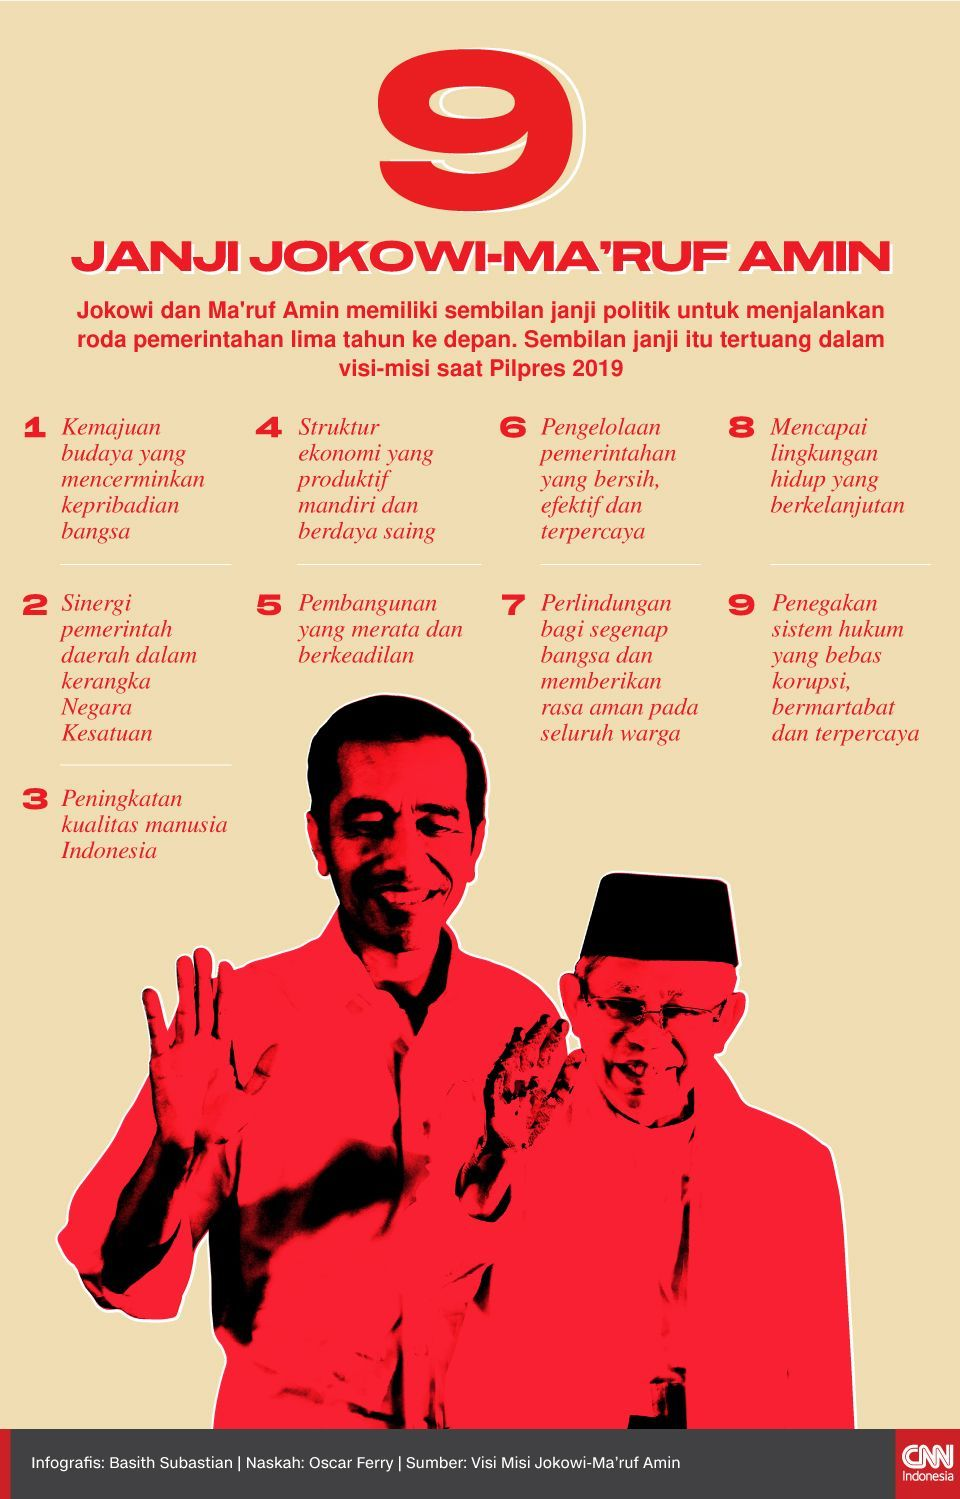 Infografis 9 Janji Jokowi-Ma'ruf Amin